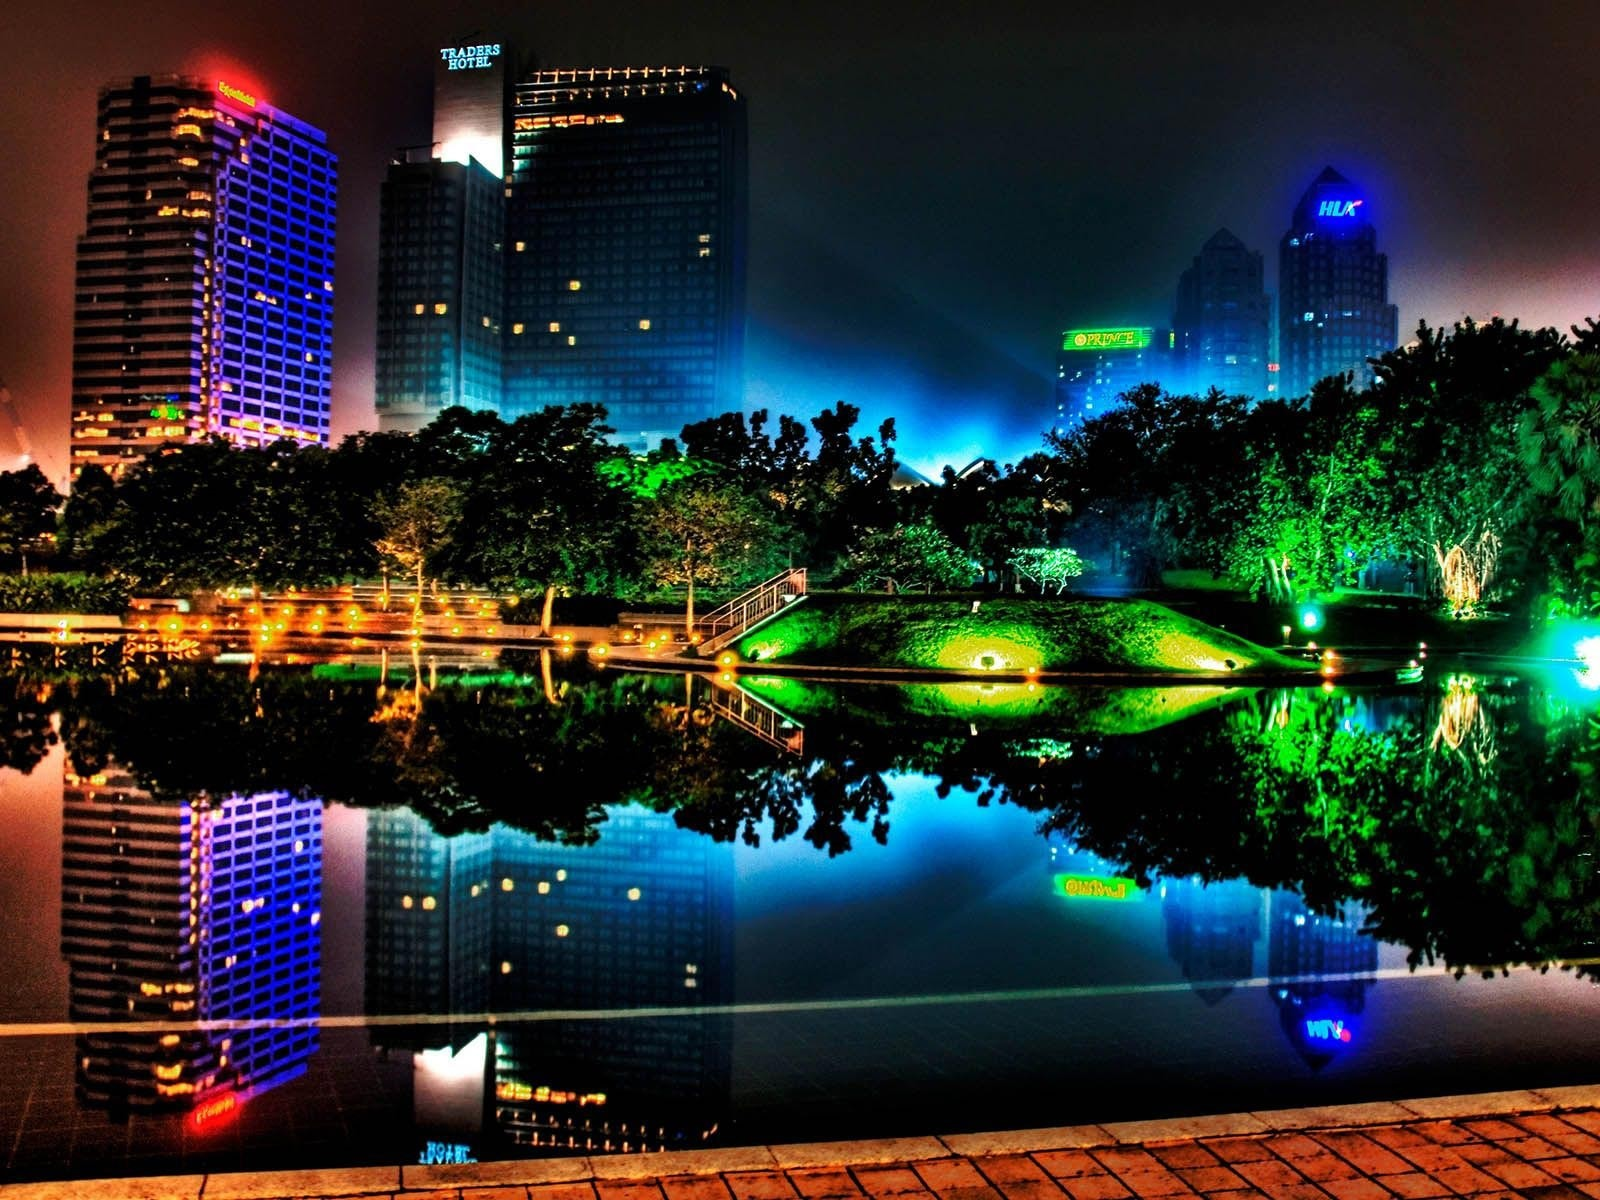 http://4.bp.blogspot.com/_XF_J0xP6x-w/TQ5Oh8tp0aI/AAAAAAAAAnE/a10pQuVaCq4/s1600/Night-Neon-1600x1200.jpg